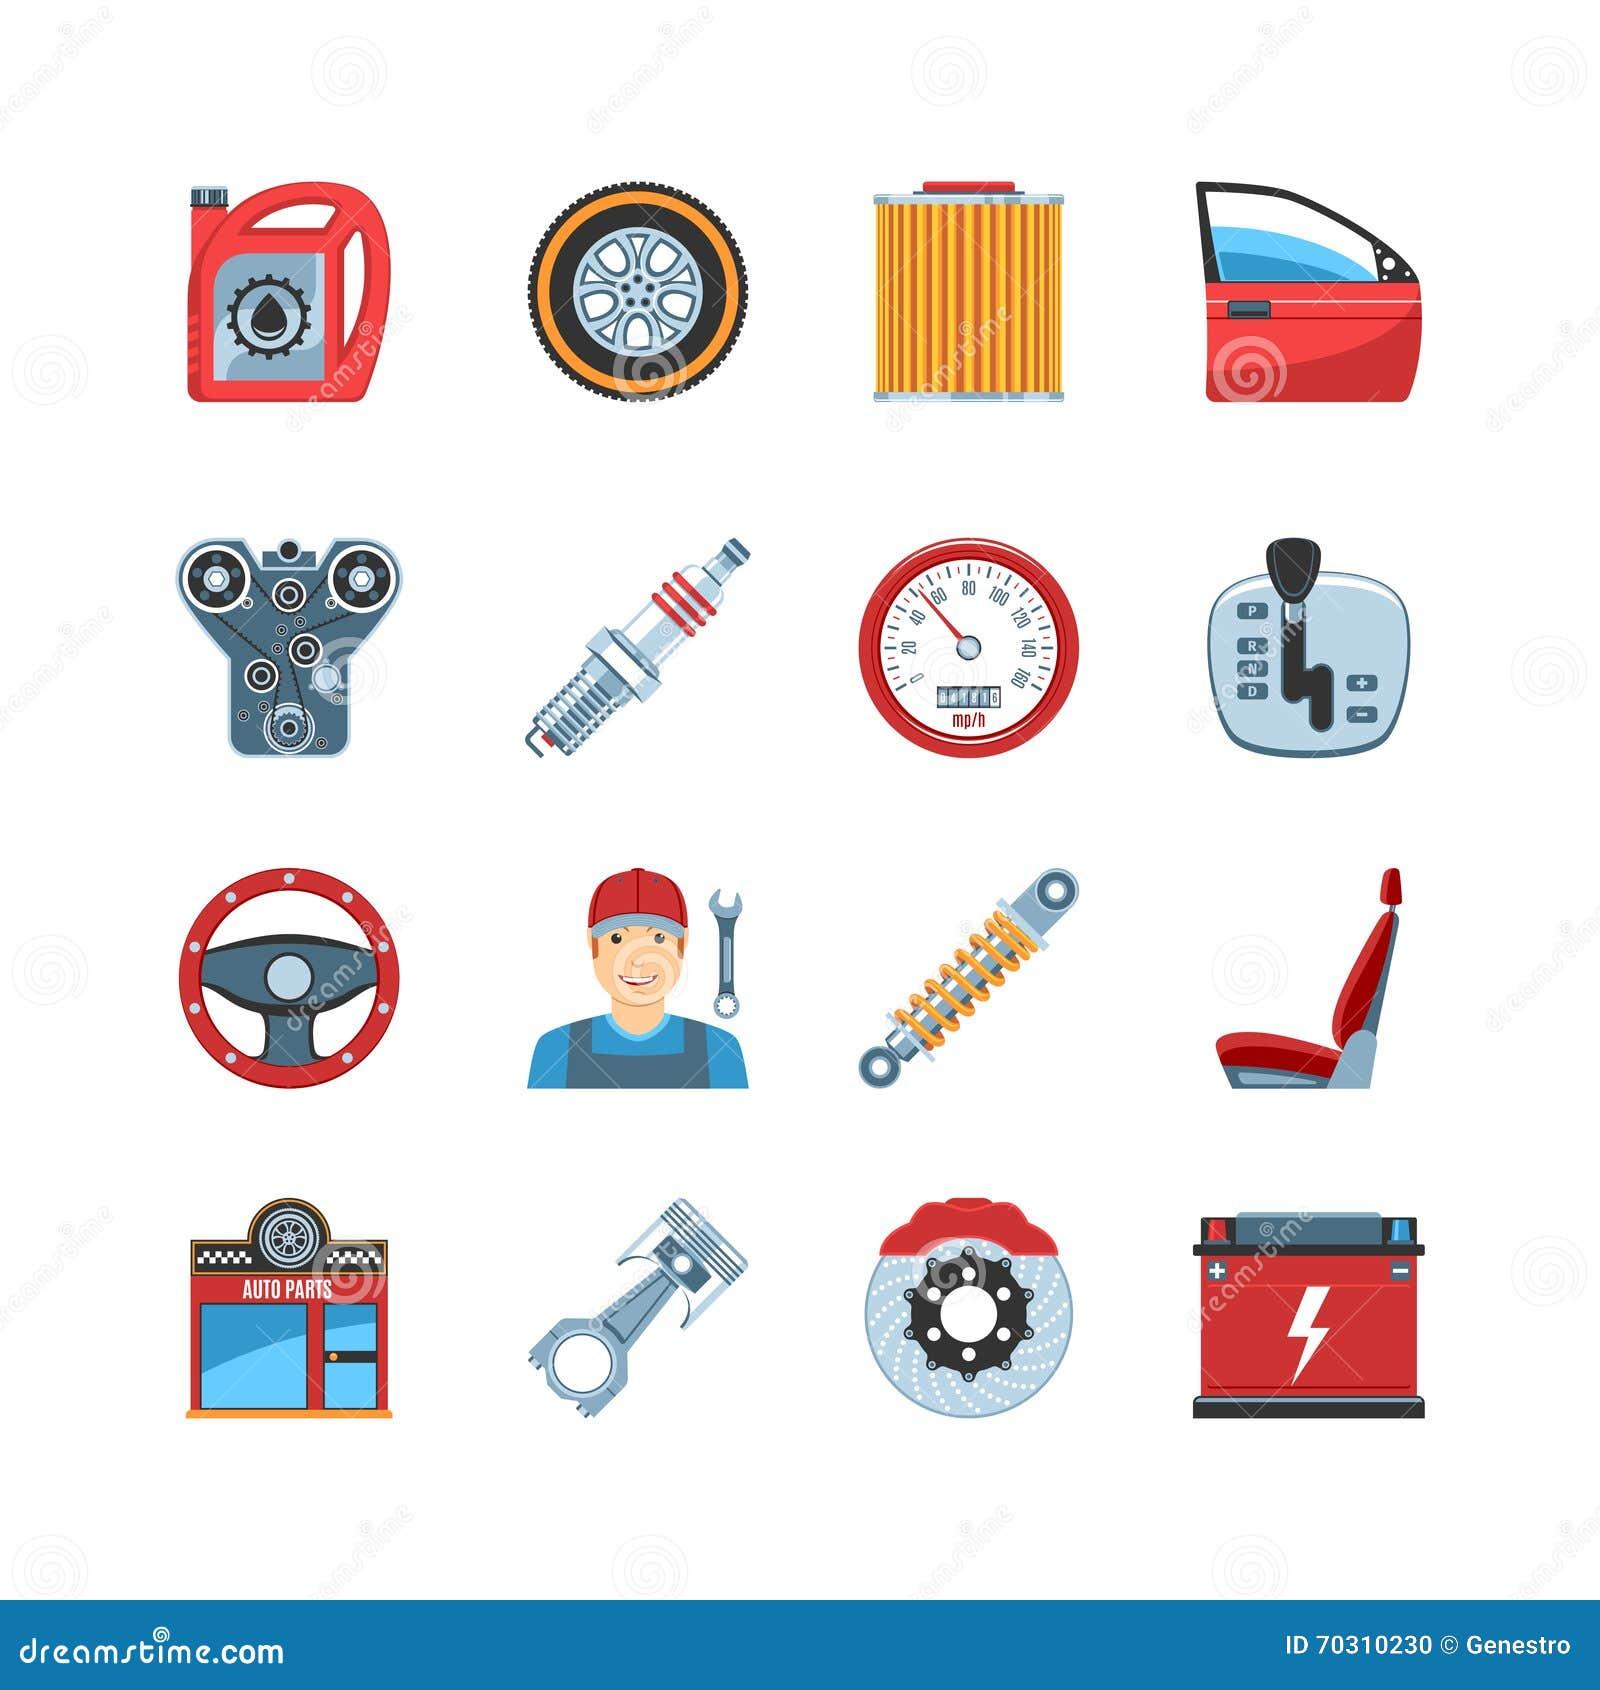 Auto Repair Parts : Auto service icons stock vector illustration of mechanic